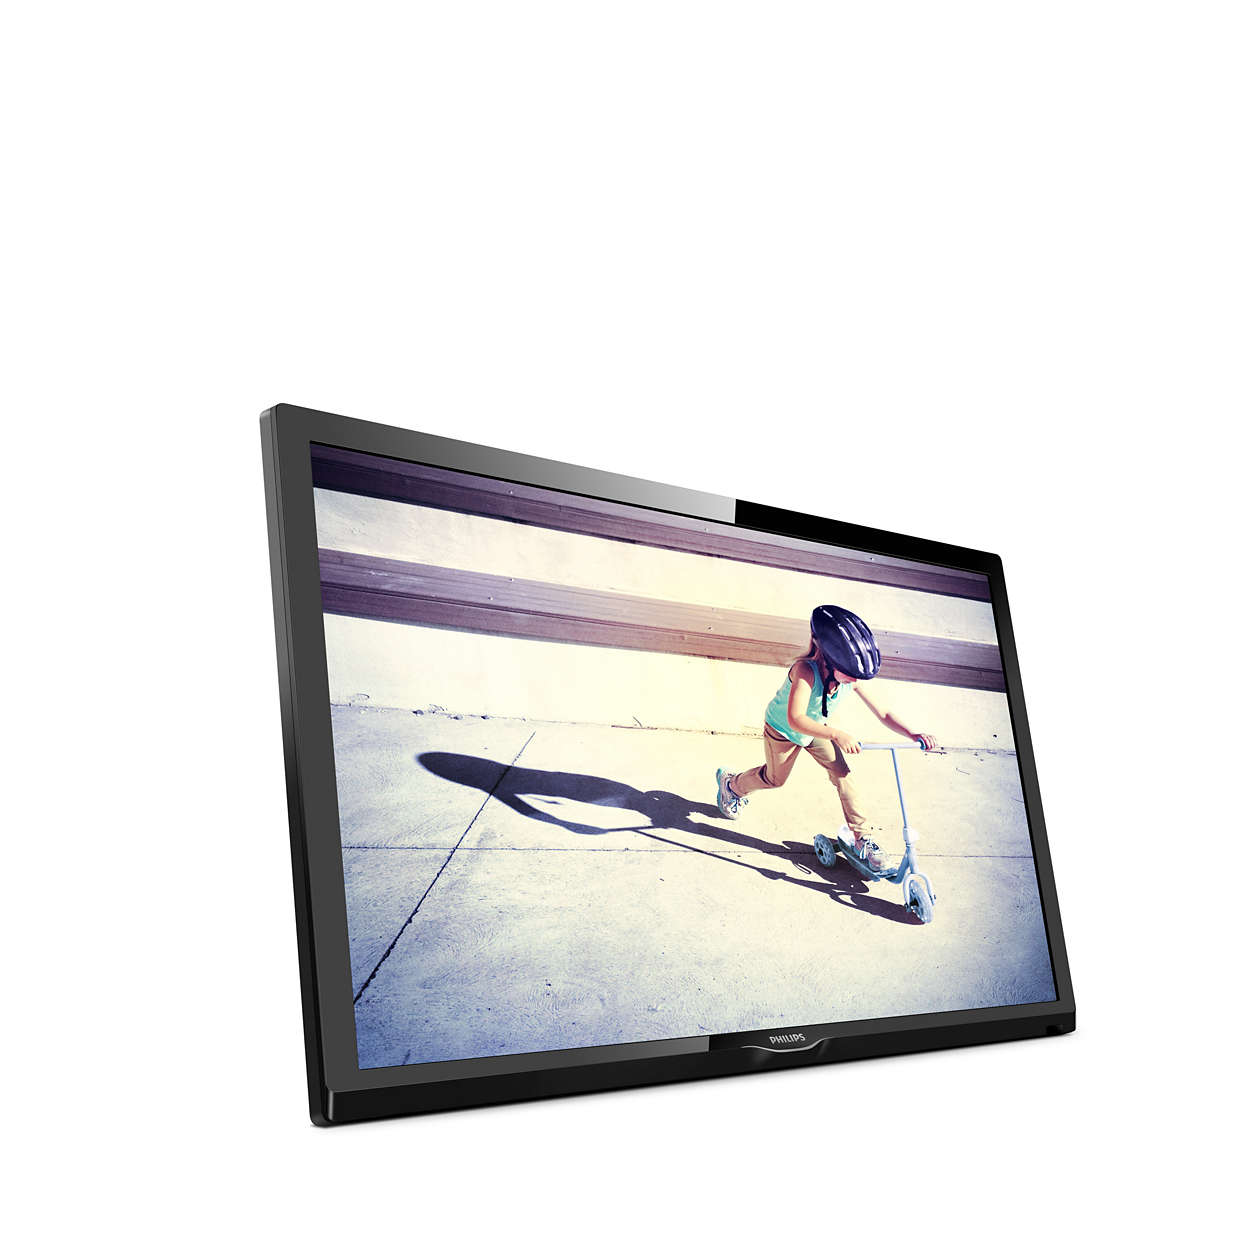 4000 series Full HD Ultra-Slim LED TV